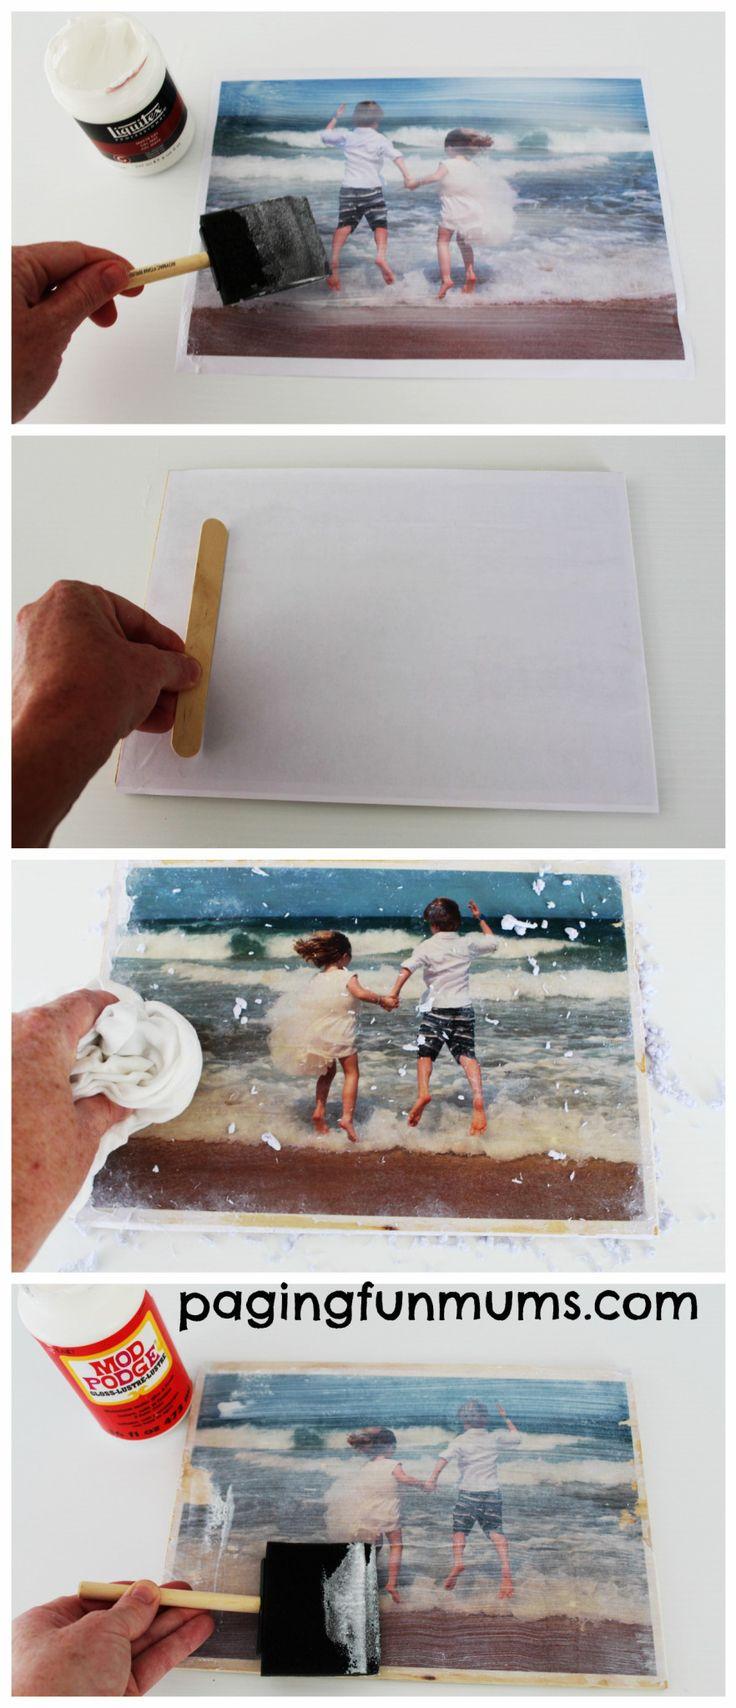 How to transfer photos onto wood